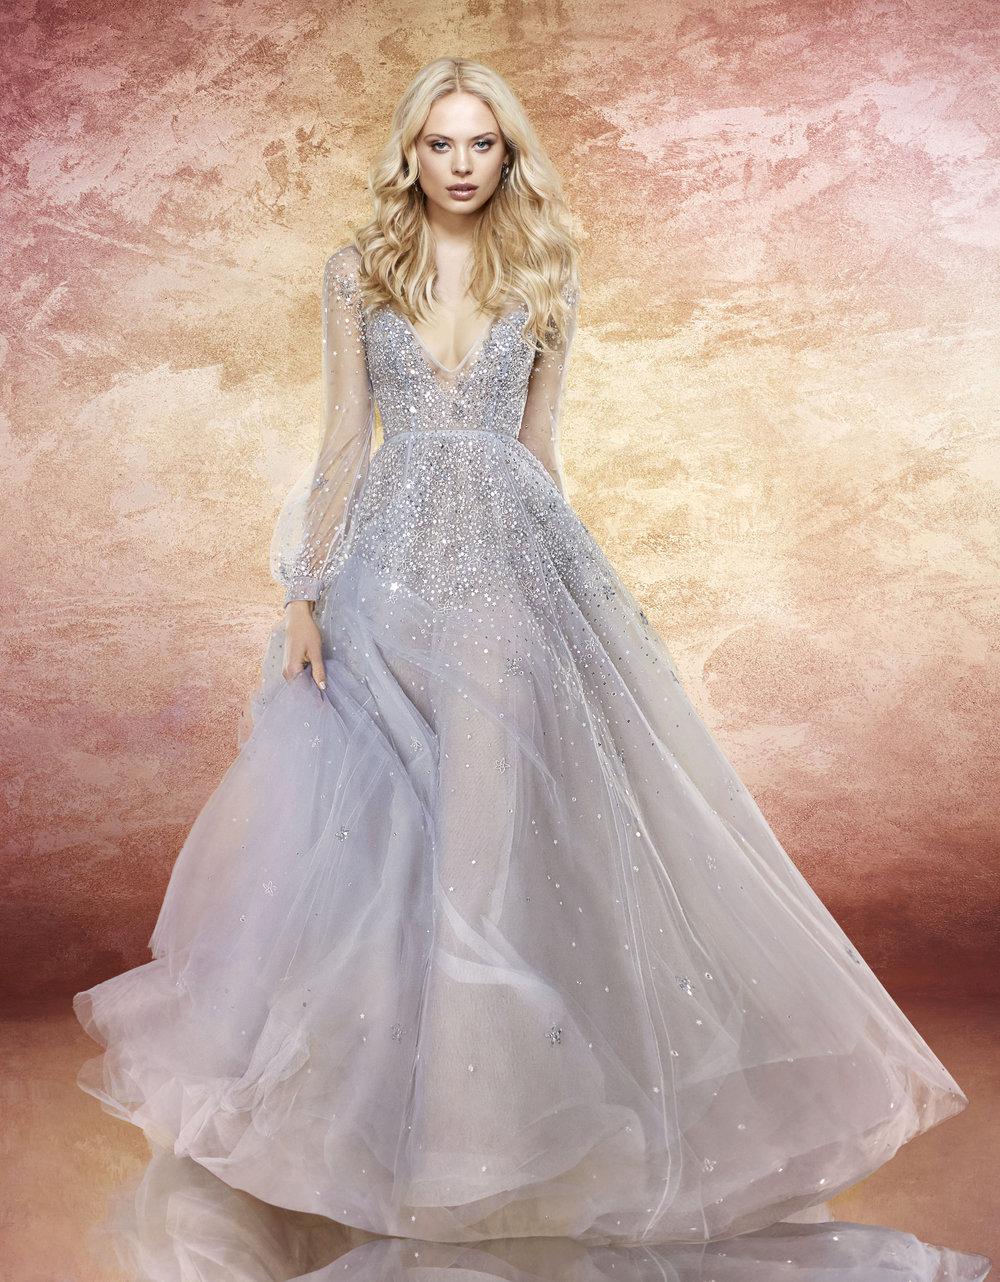 hayley-paige-bridal-spring-2017-style-6700-lumi_3.jpg